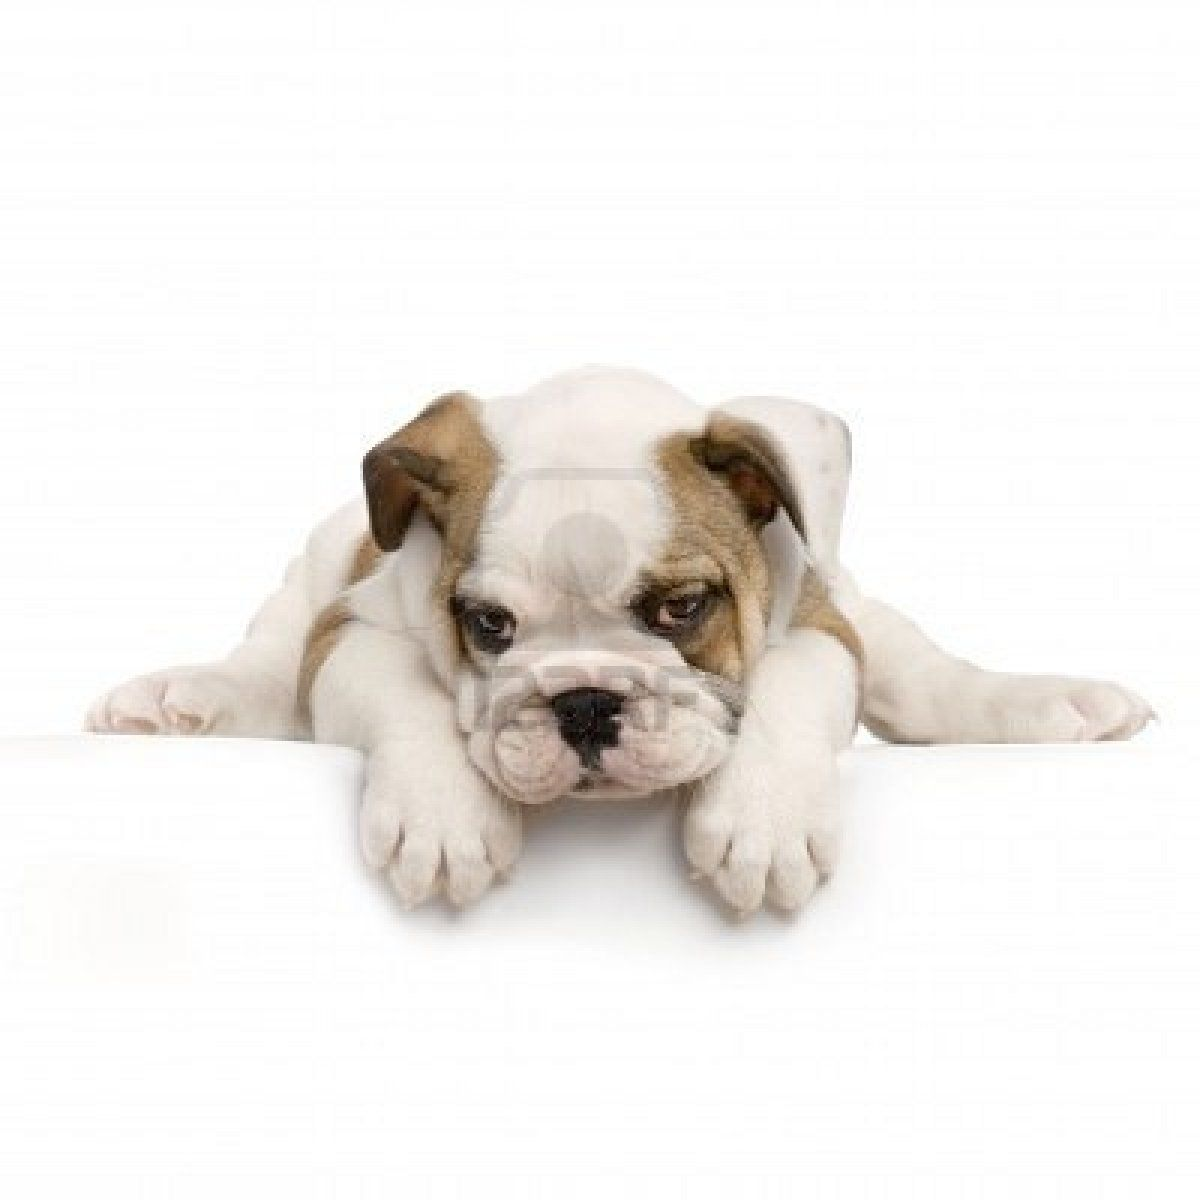 Stock Photo Bulldog Puppies English Bulldog Puppies Cute Puppy